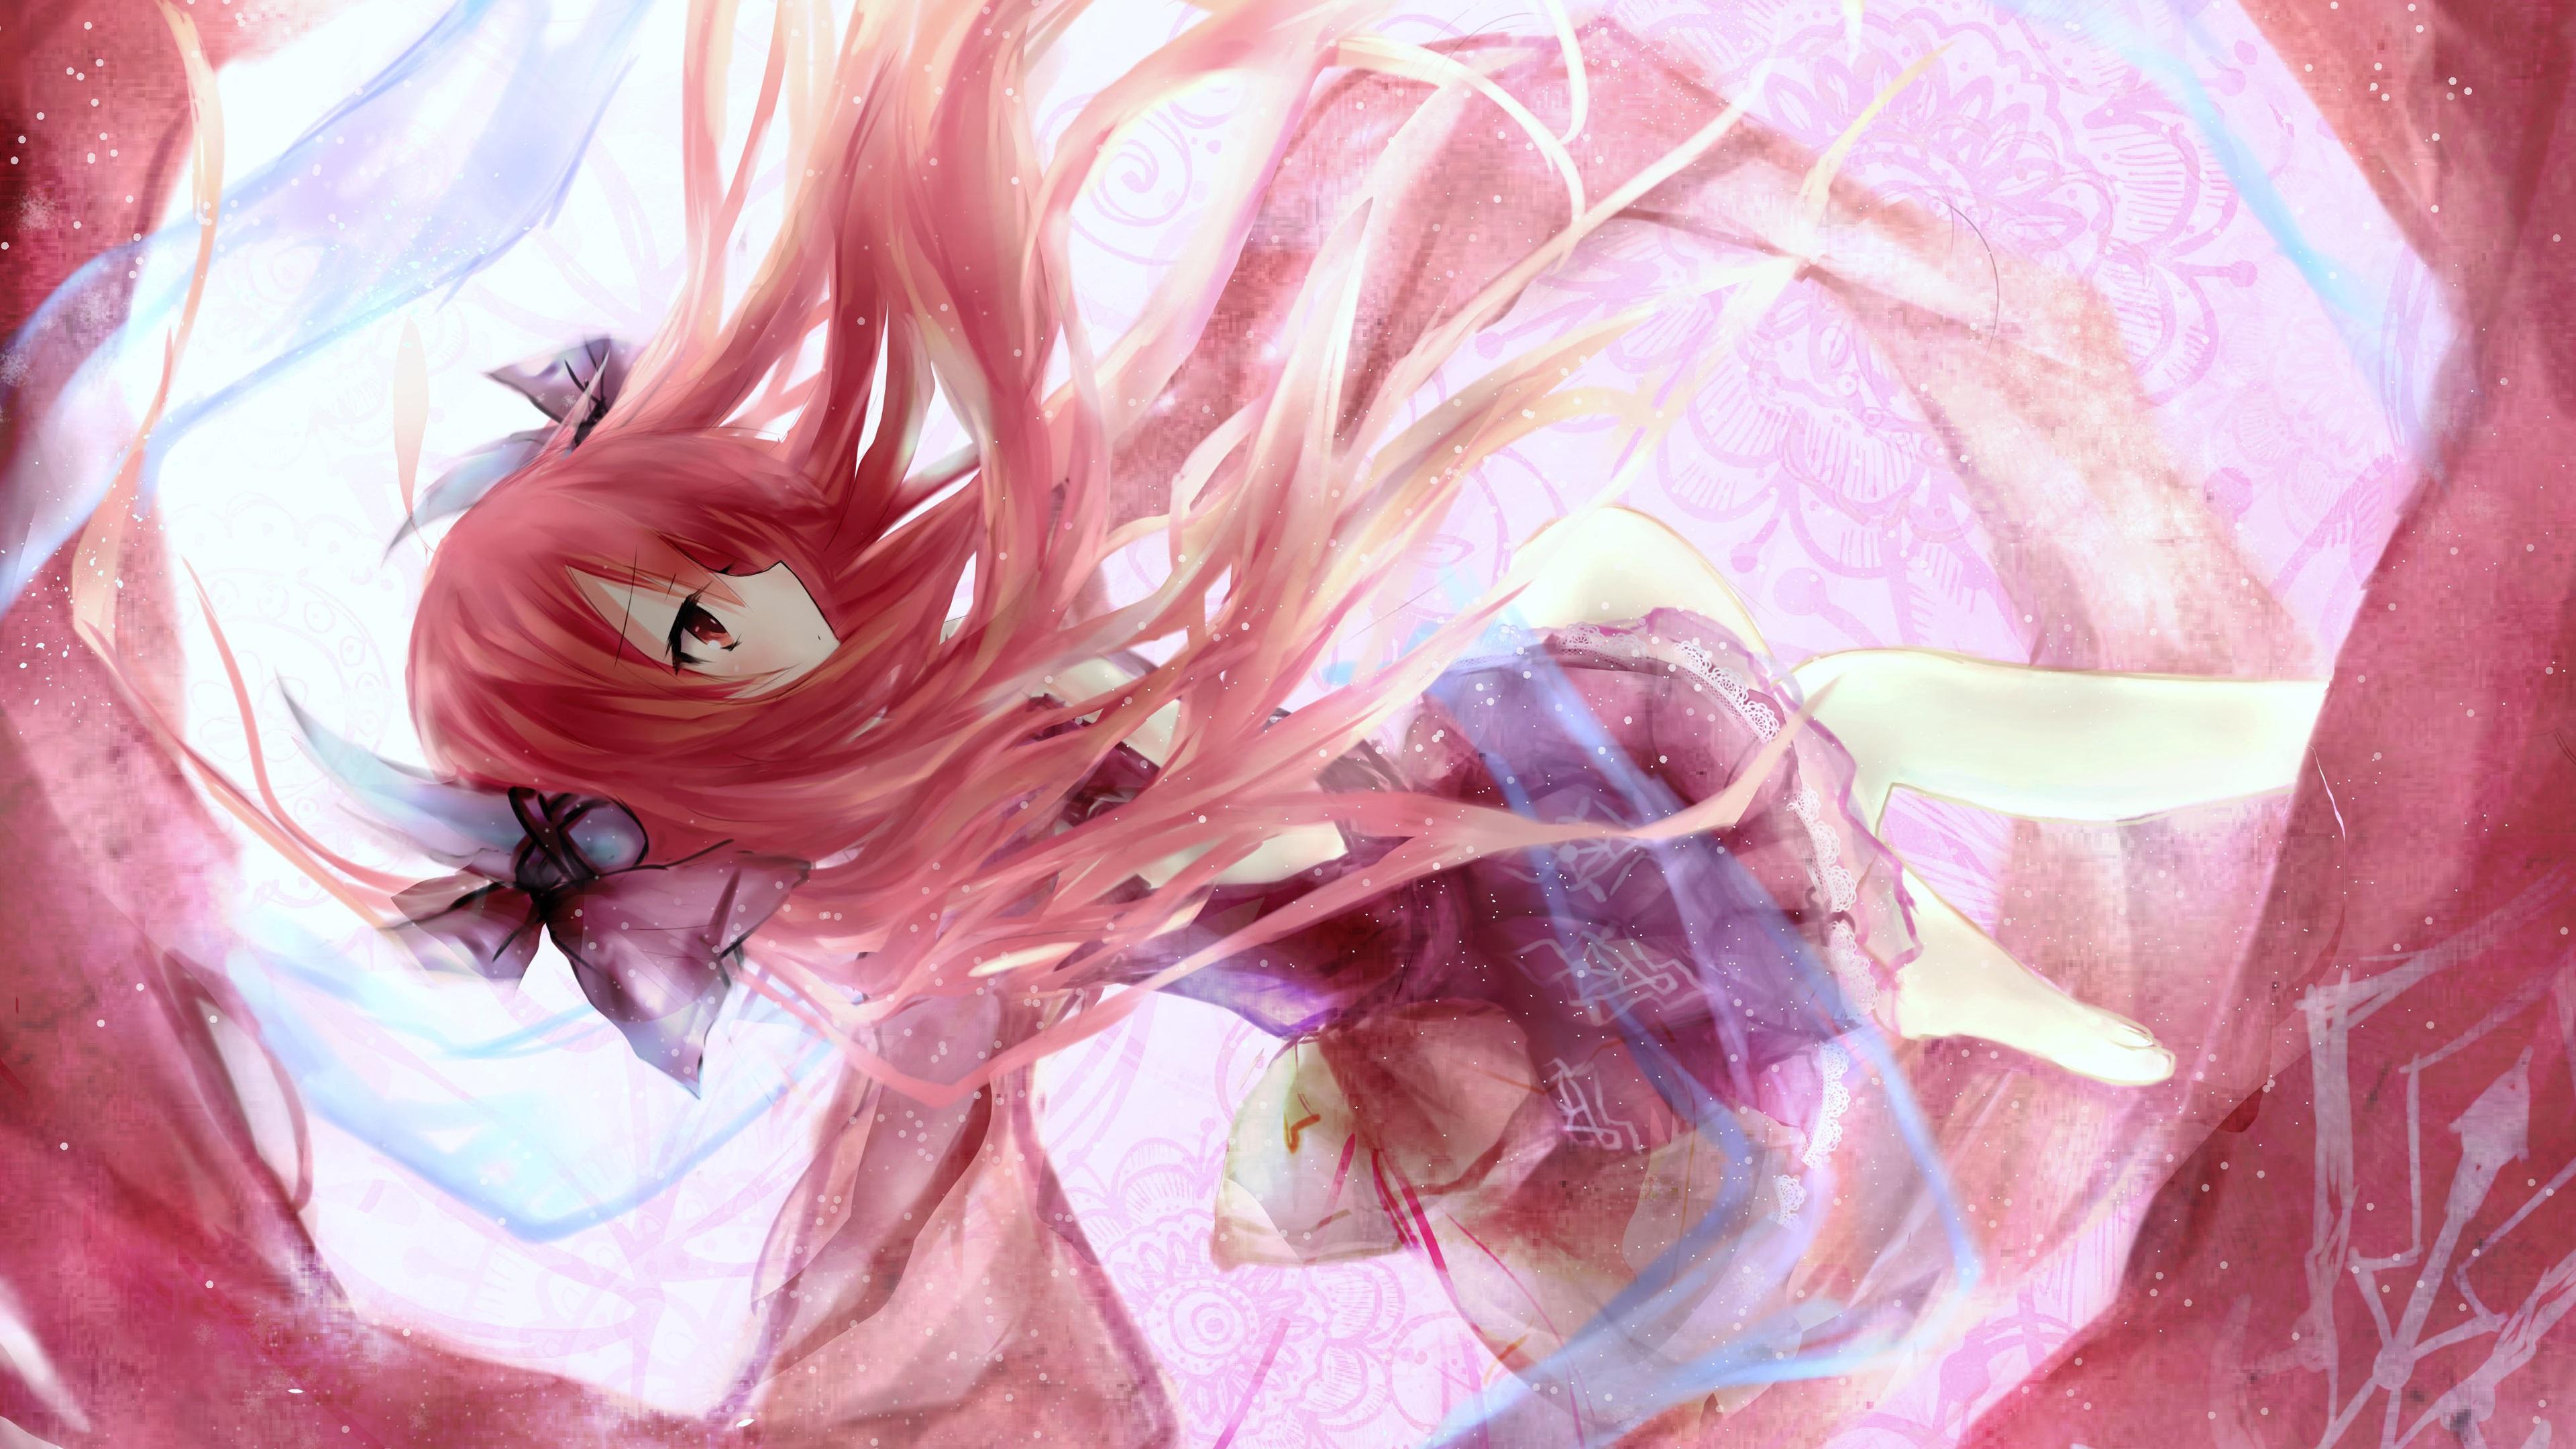 Wallpaper Girl For Iphone 壁纸 粉红色的头发动漫女孩跳舞 3840x2160 Uhd 4k 高清壁纸 图片 照片